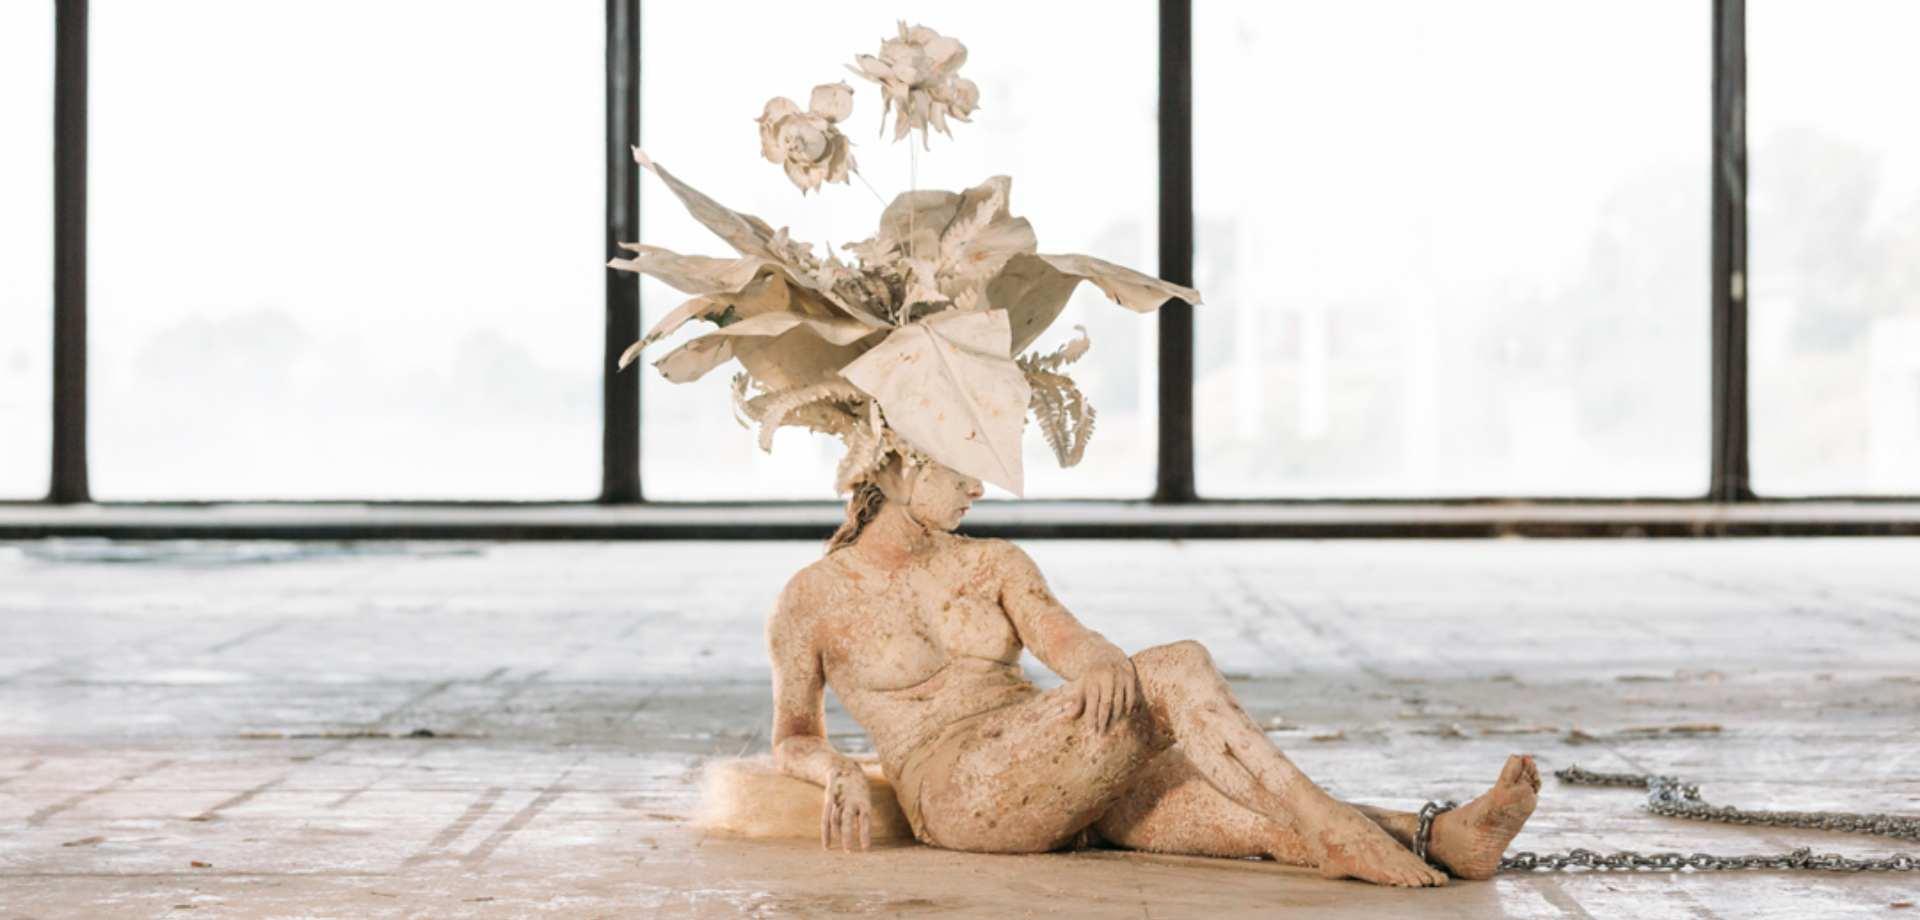 Project «Δημόσιες Εικαστικές Προβολές _ Public Art Projections» - Momus